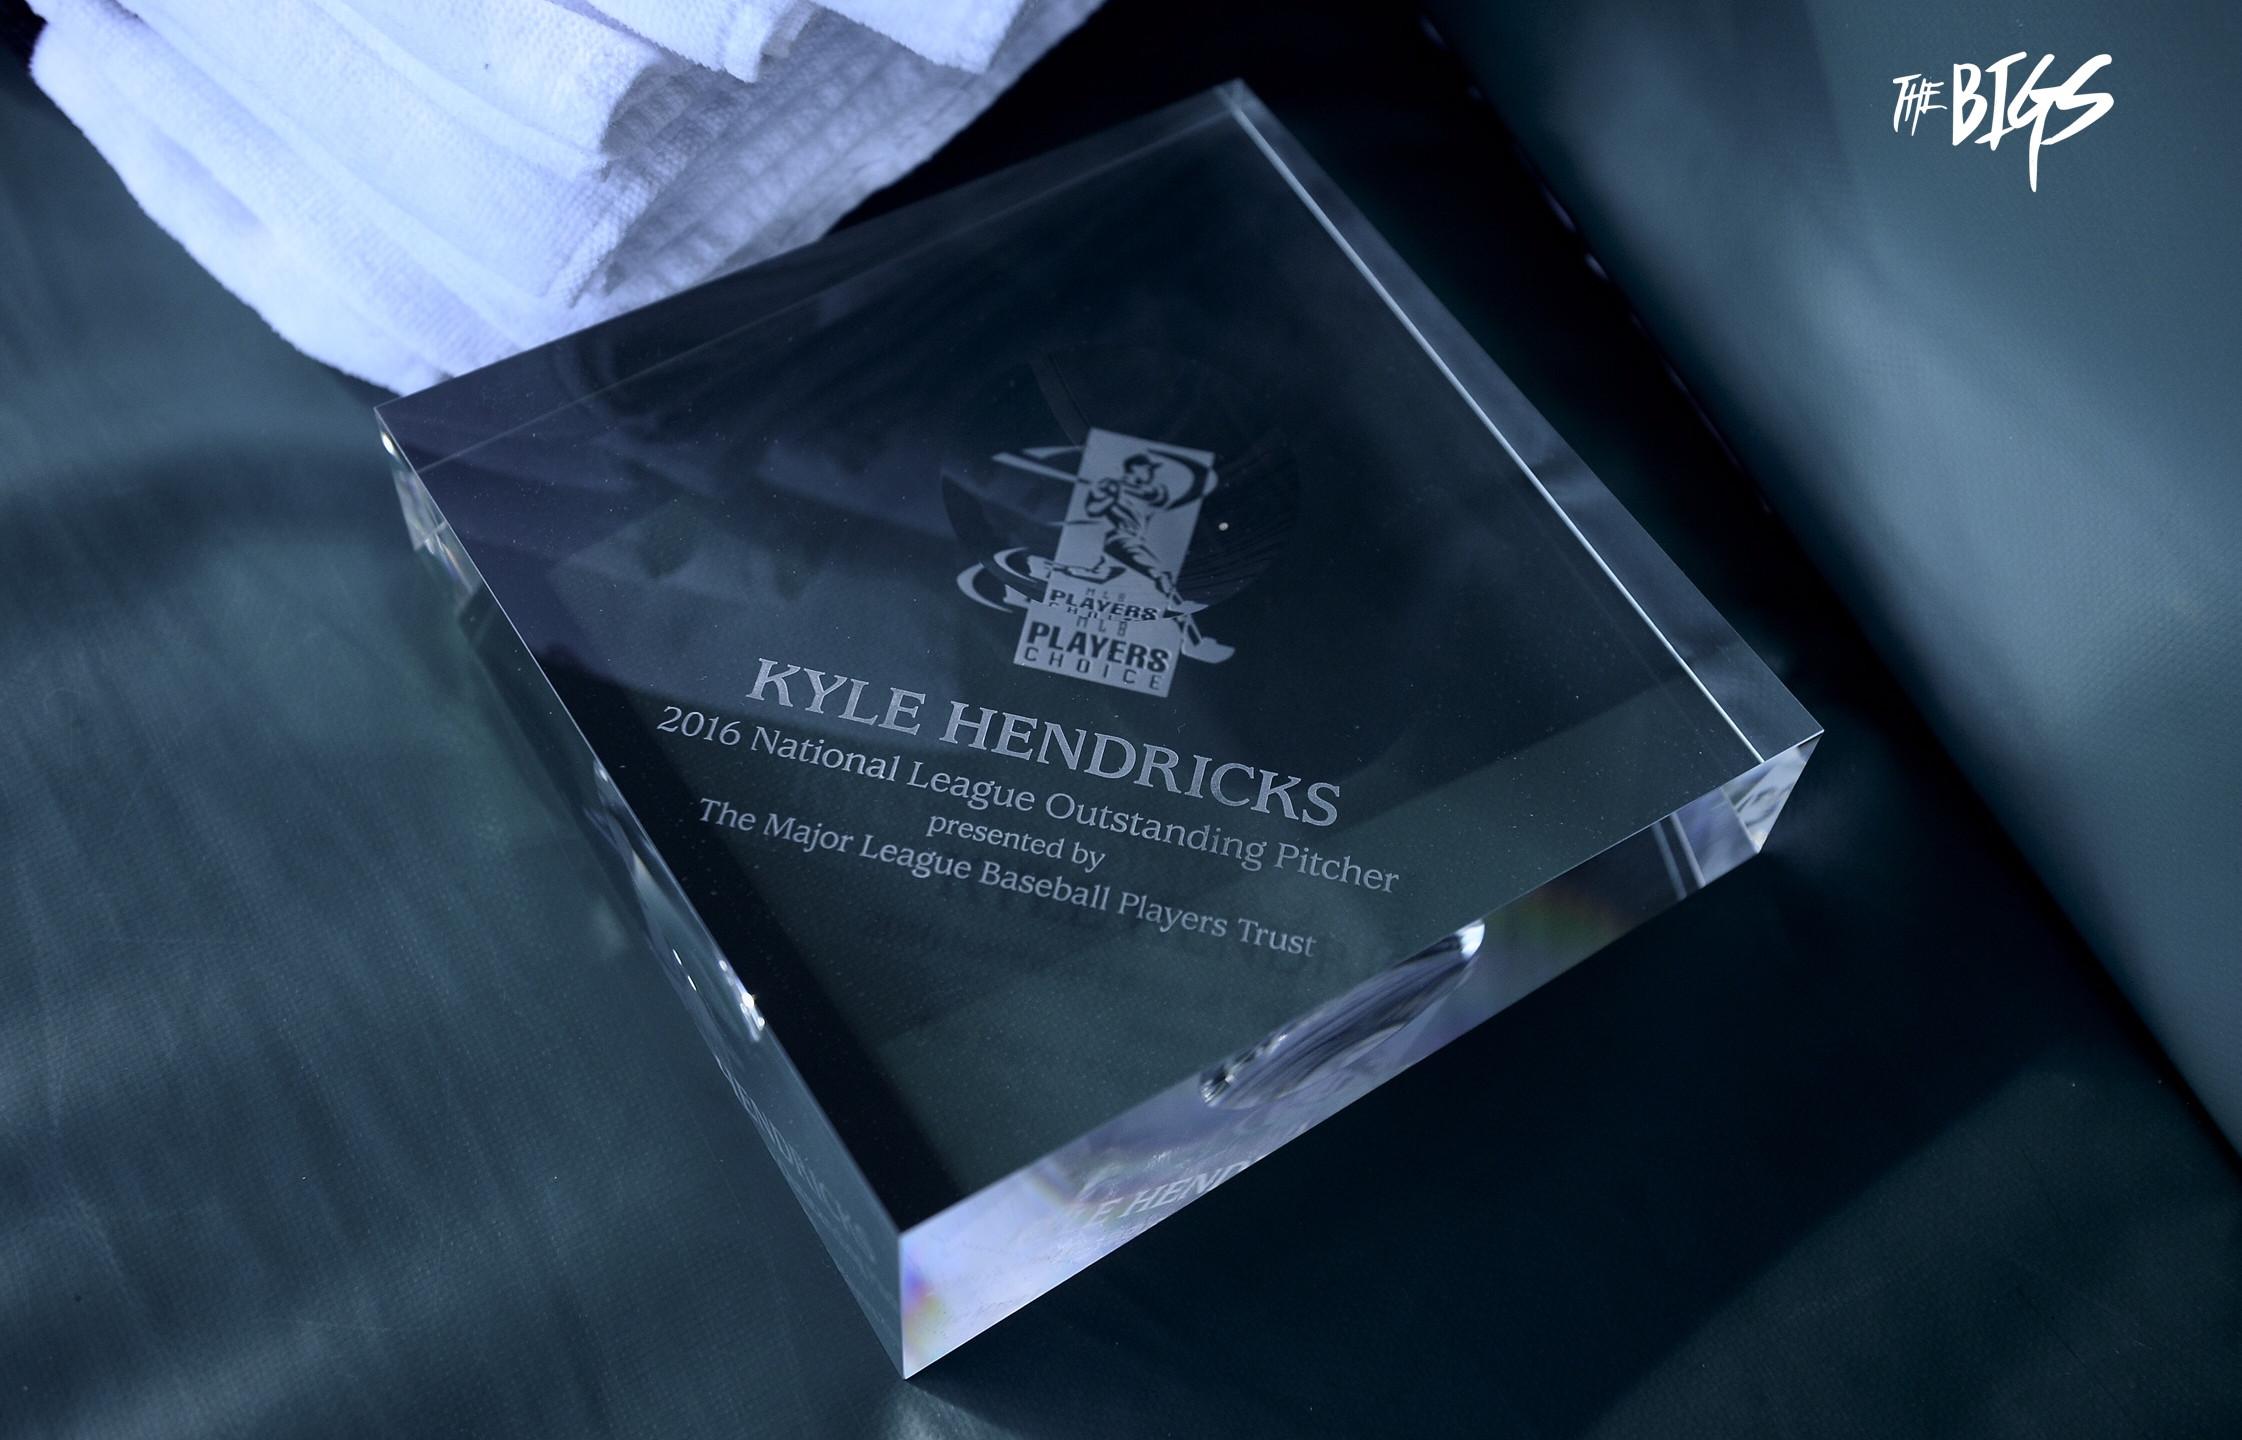 Kyle Hendricks Award